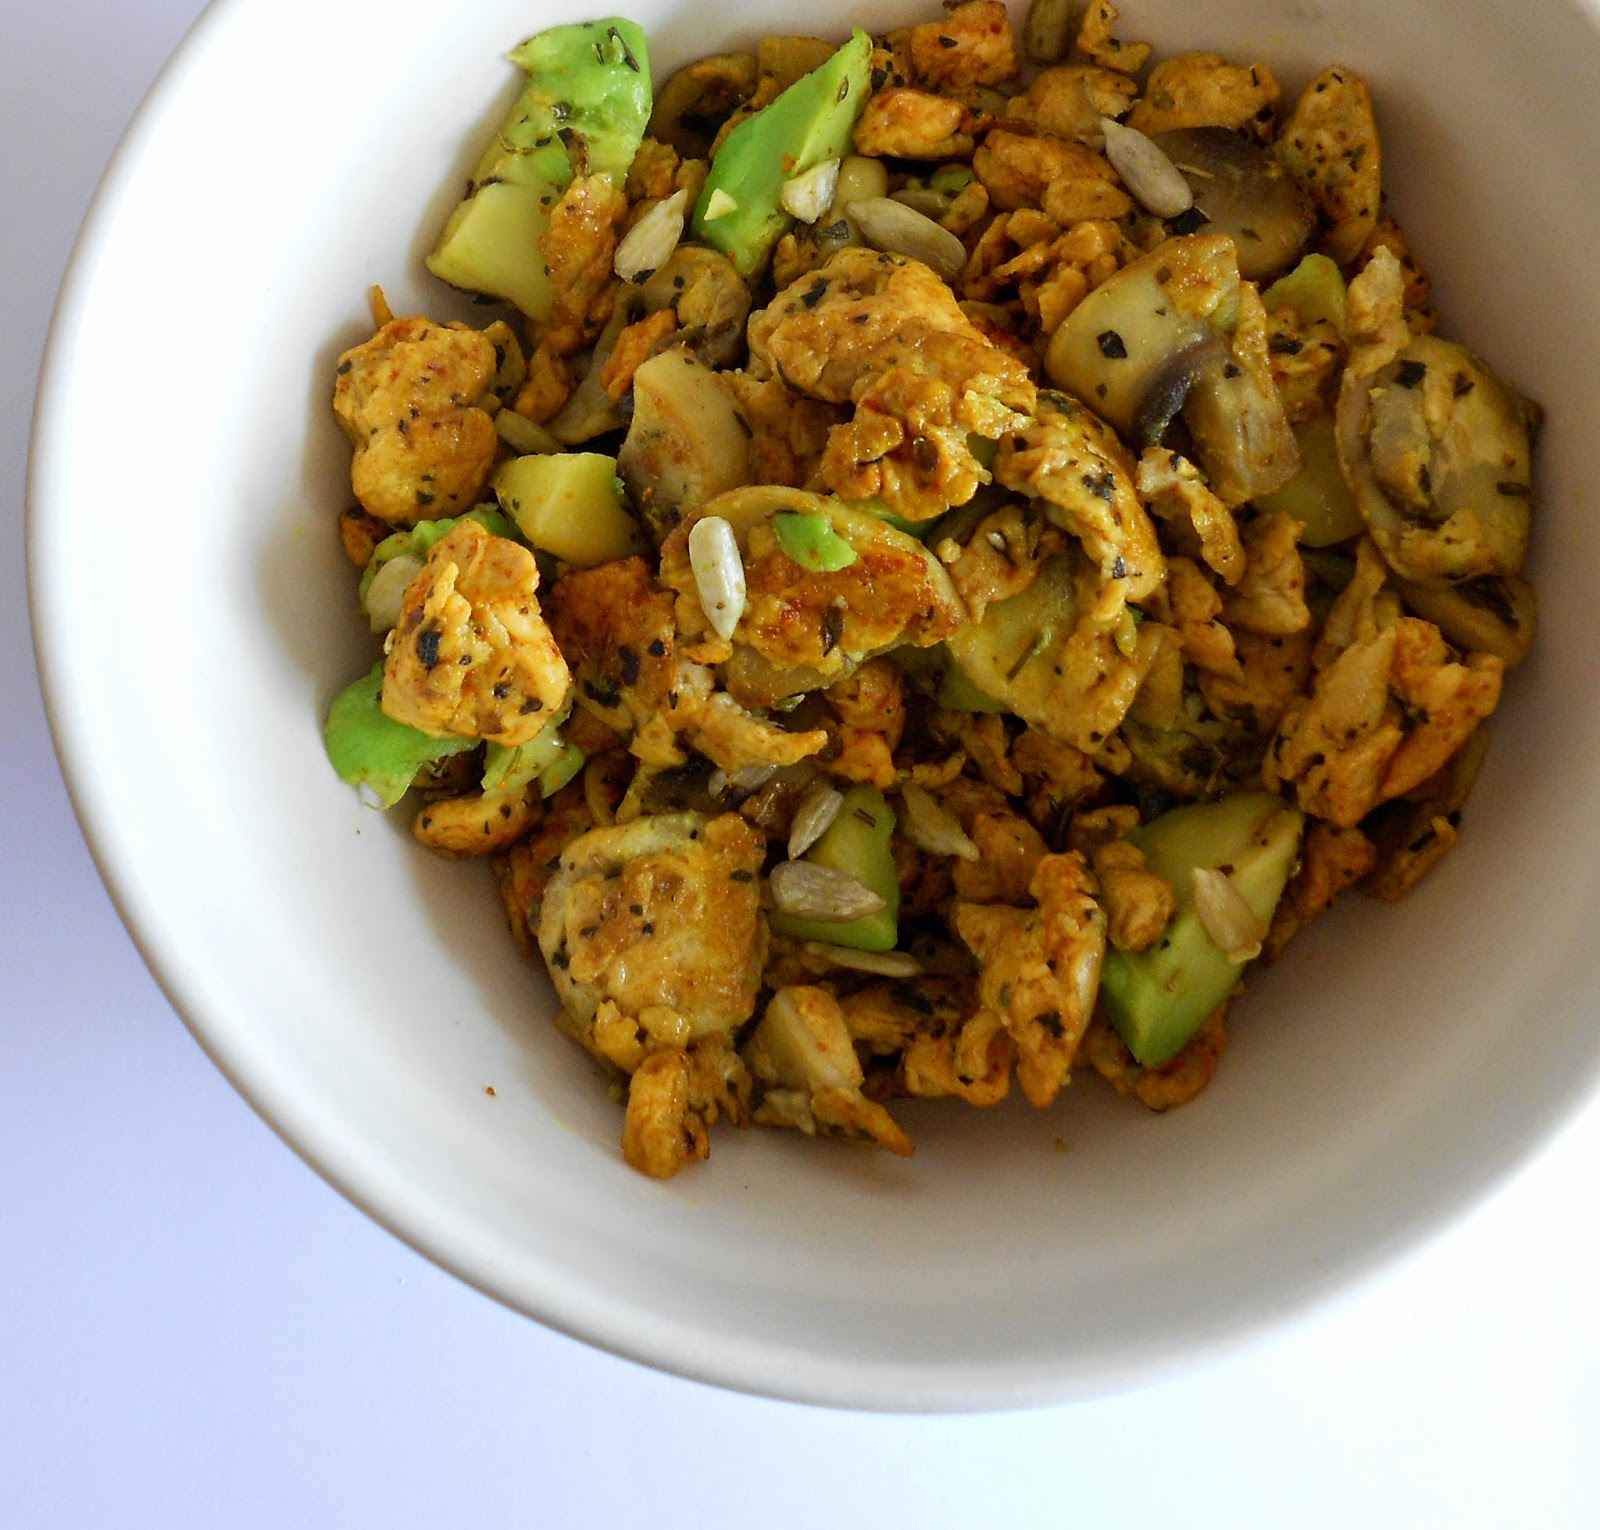 herbalgreeninfinitea: Spicy scrambled eggs met avocado